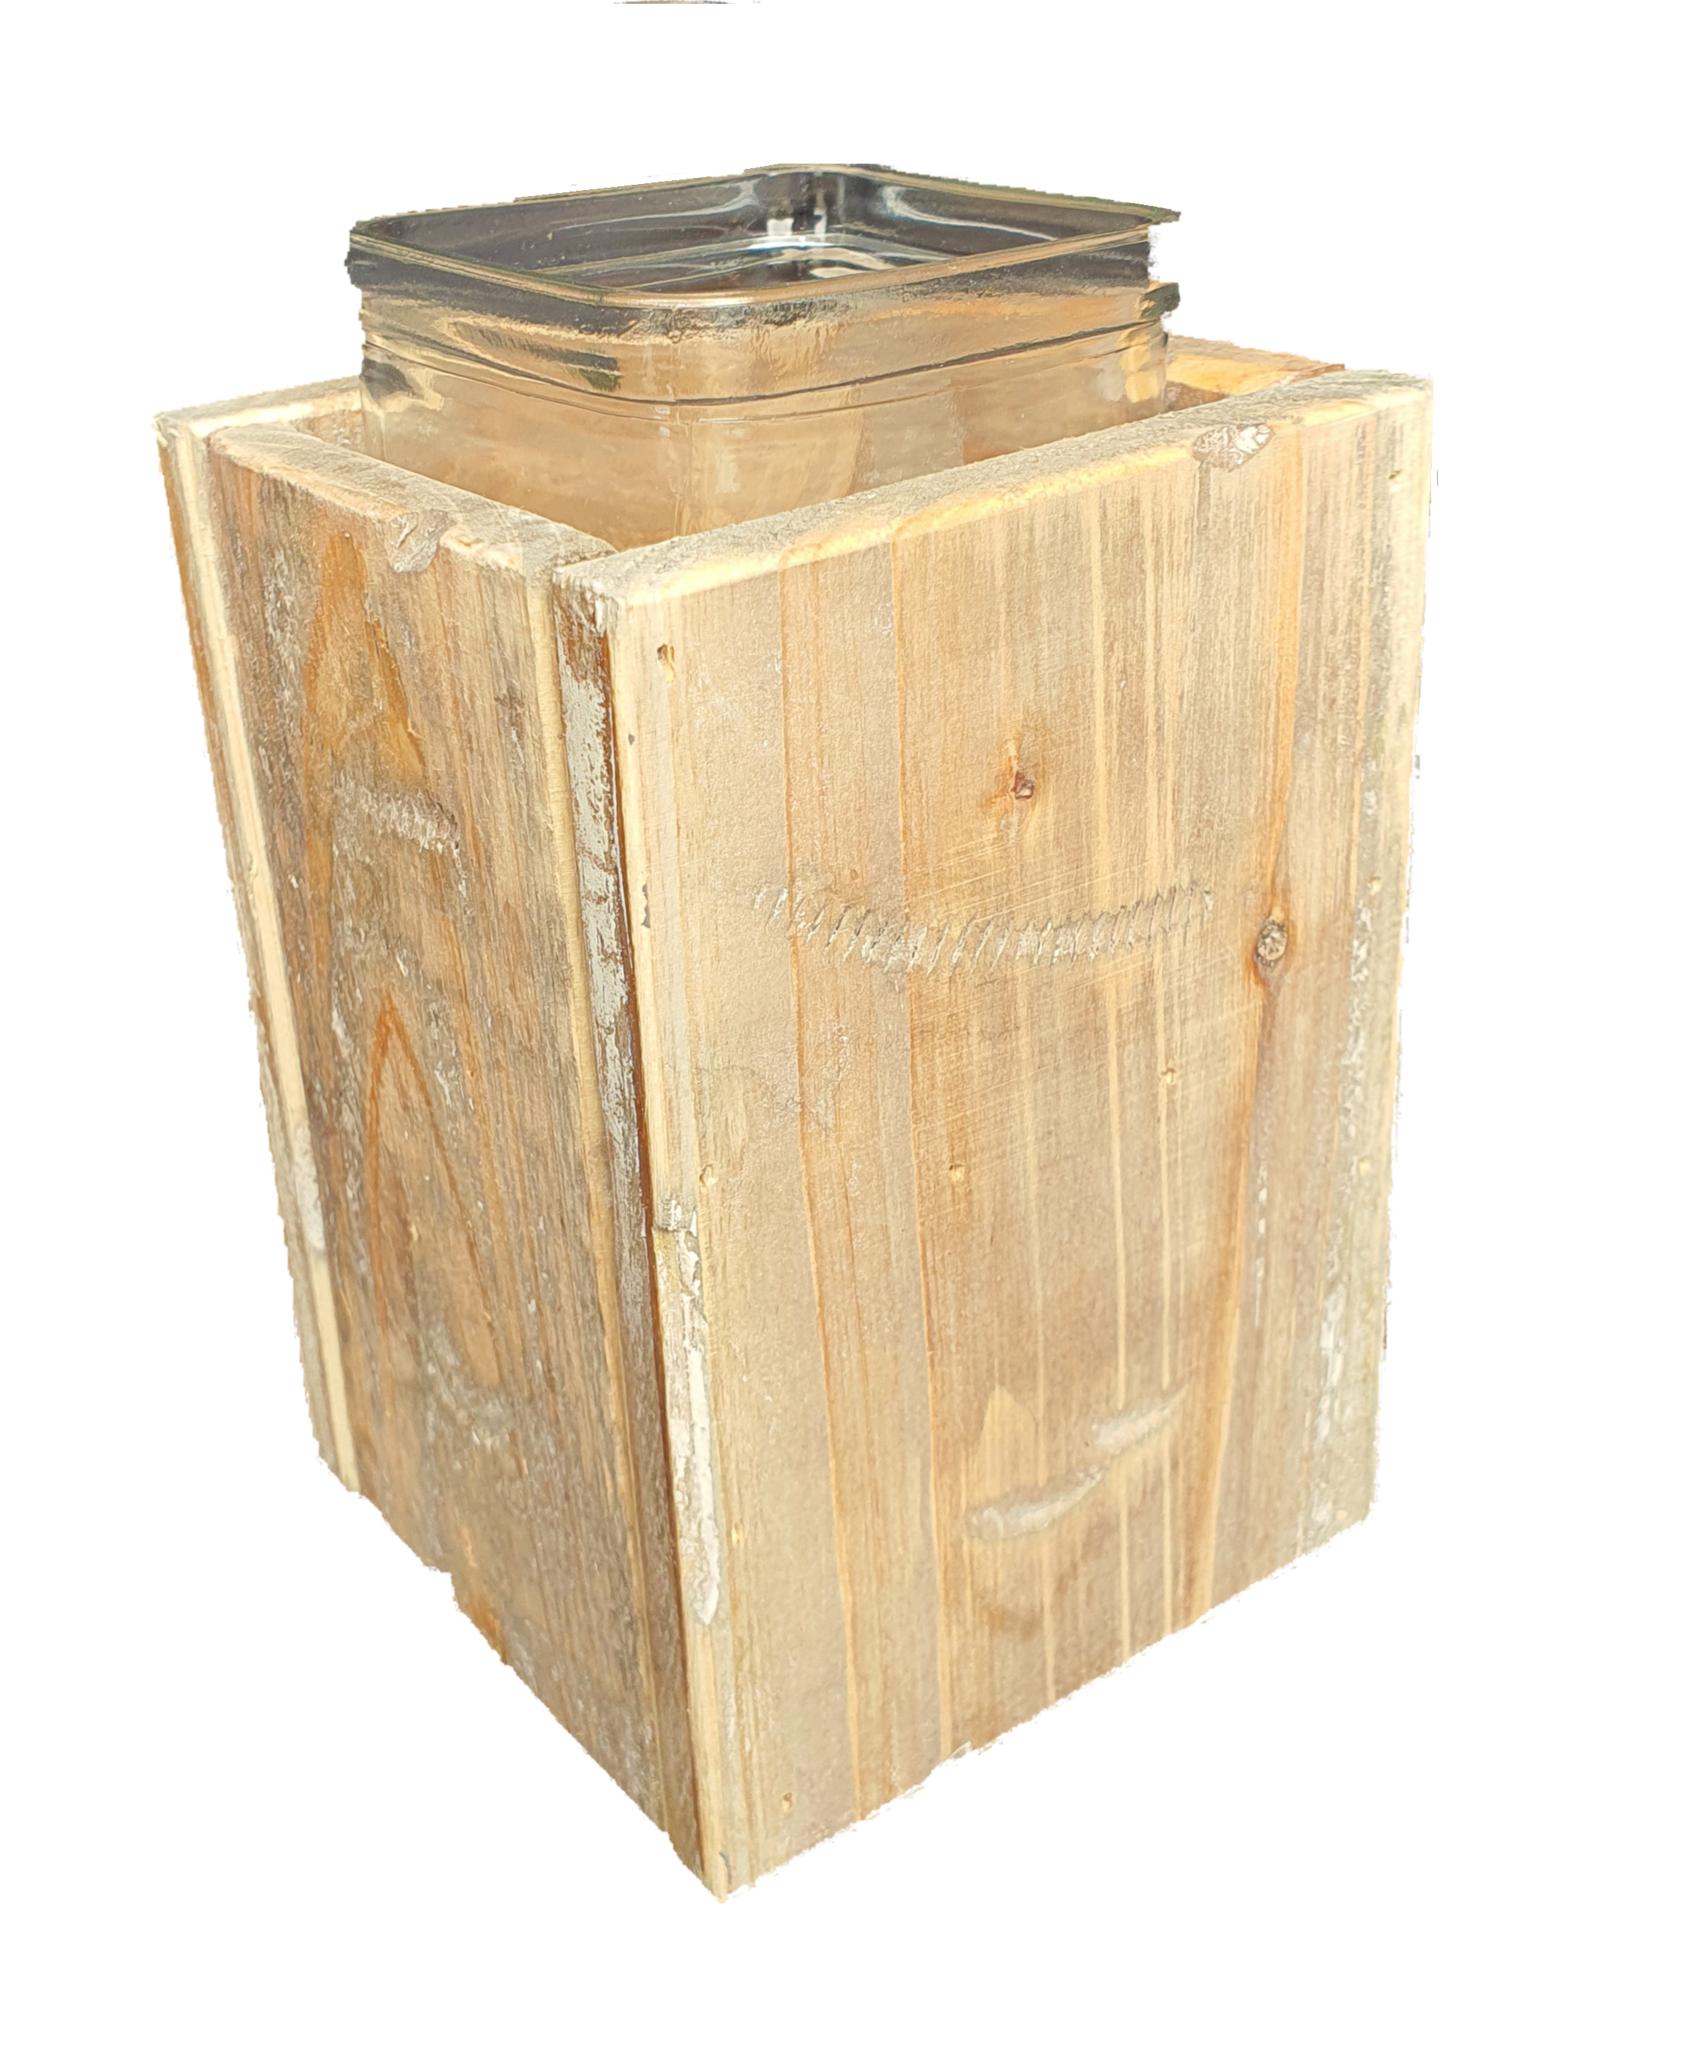 pot old dutchglass hold 2 sides 15-2